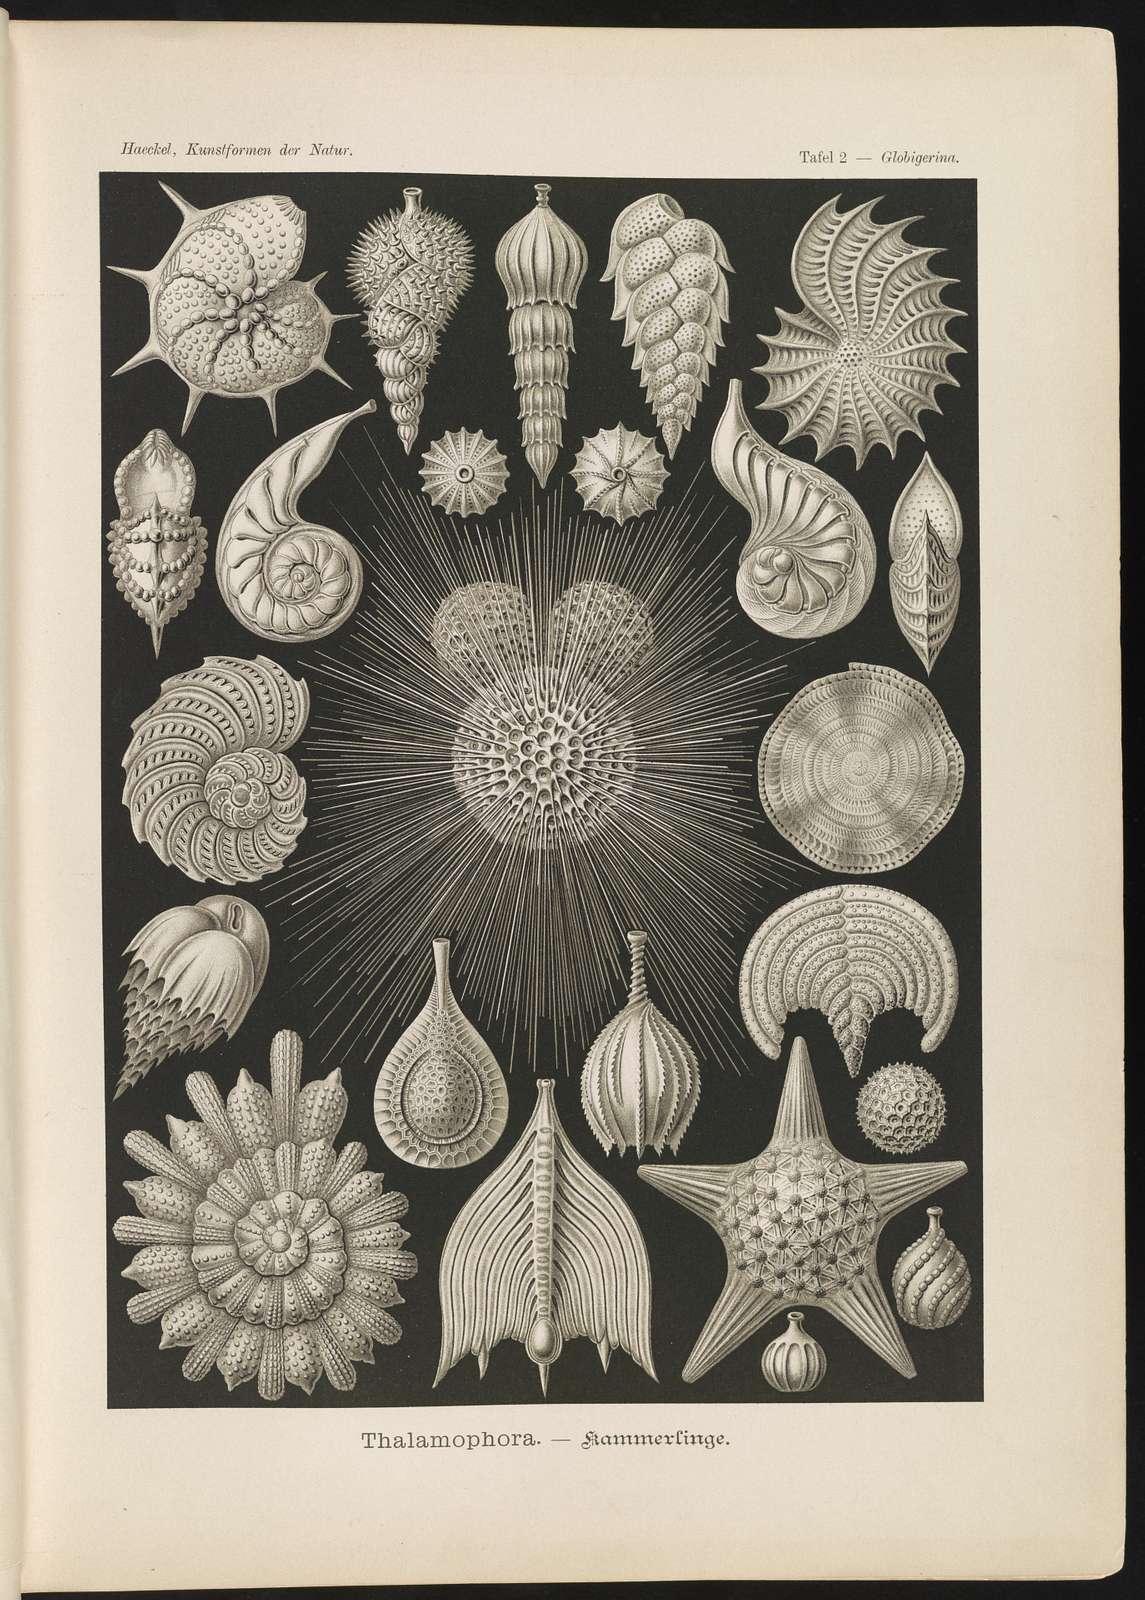 Thalamophora. - Kammerlinge